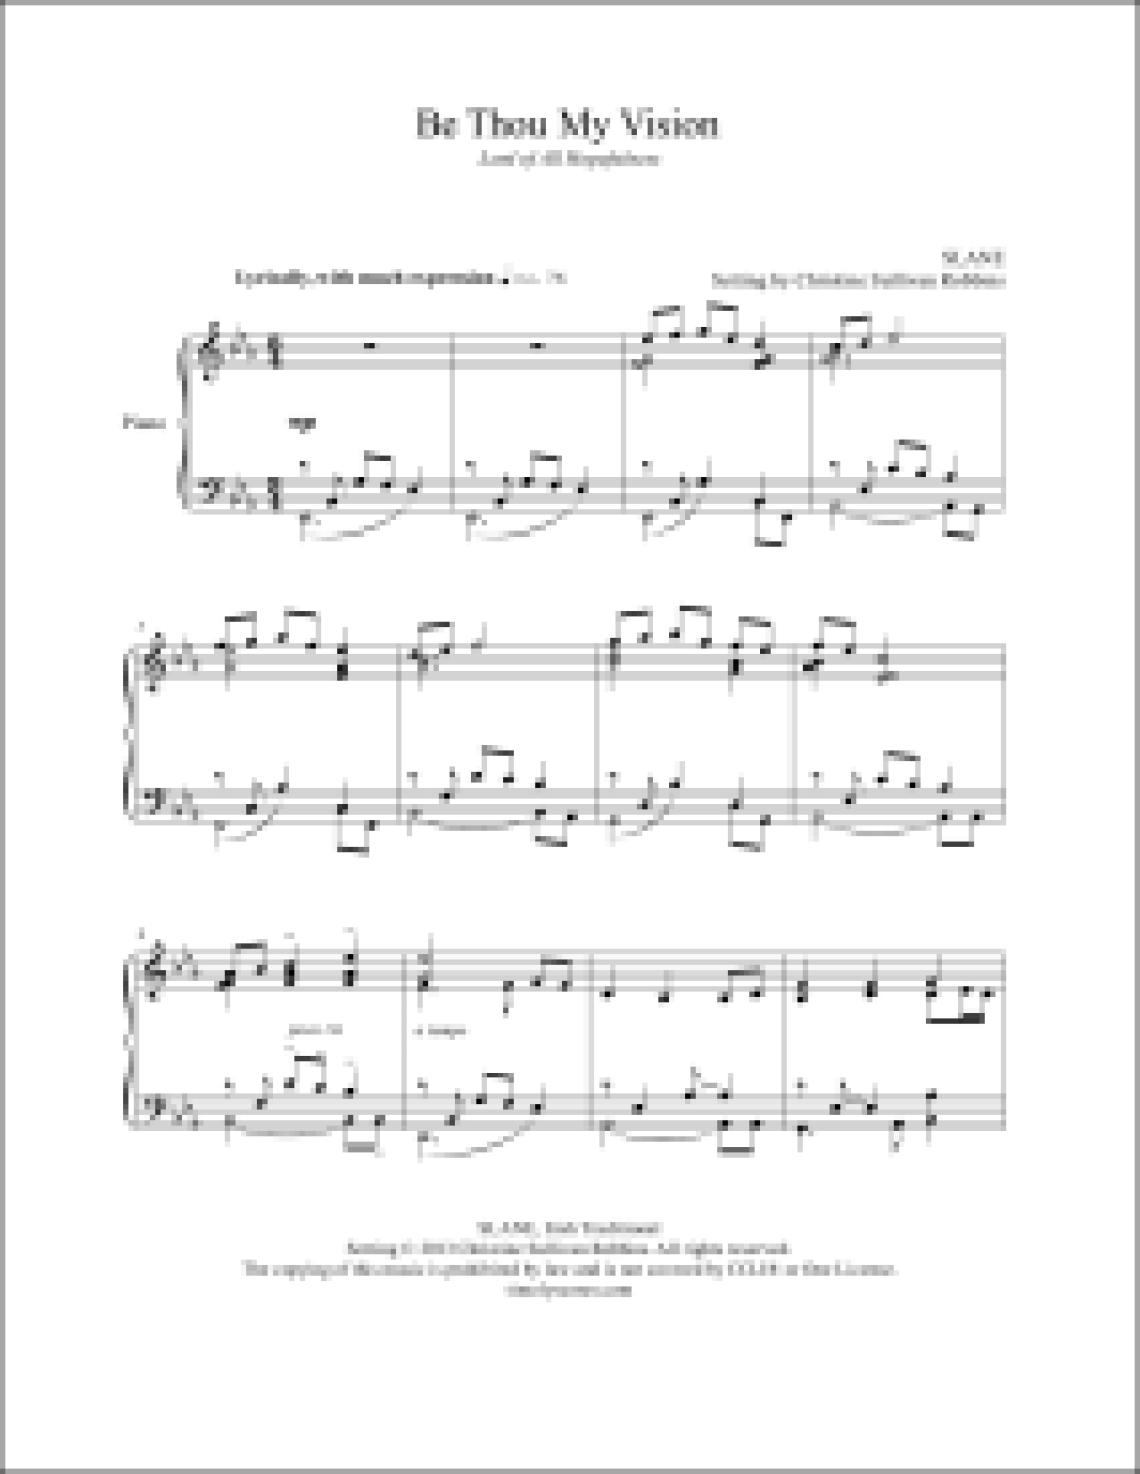 Be Thou My Vision Piano Sheet Music